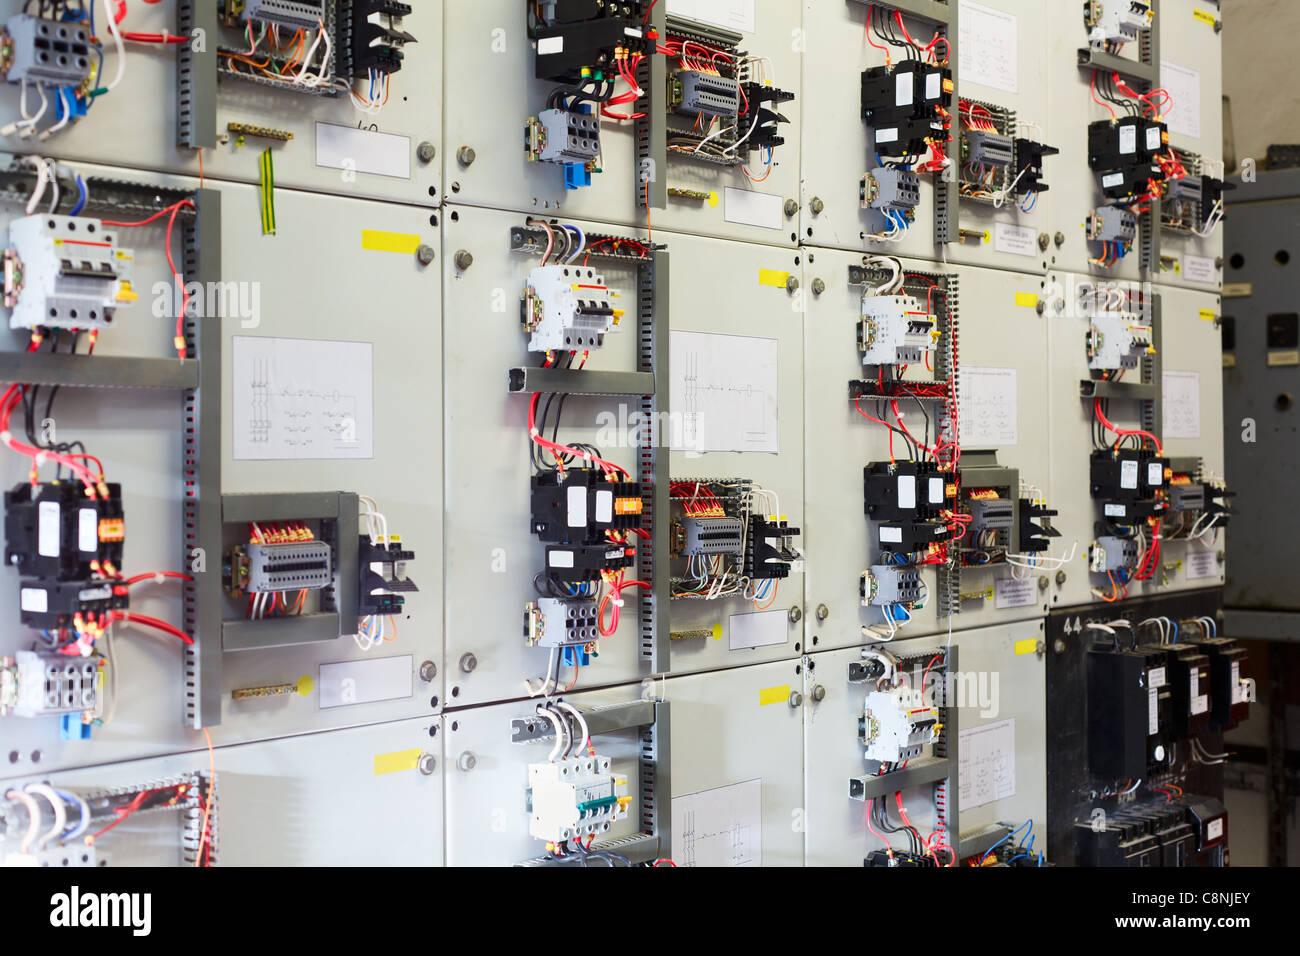 Electric Service Panel Stock Photos & Electric Service Panel Stock ...